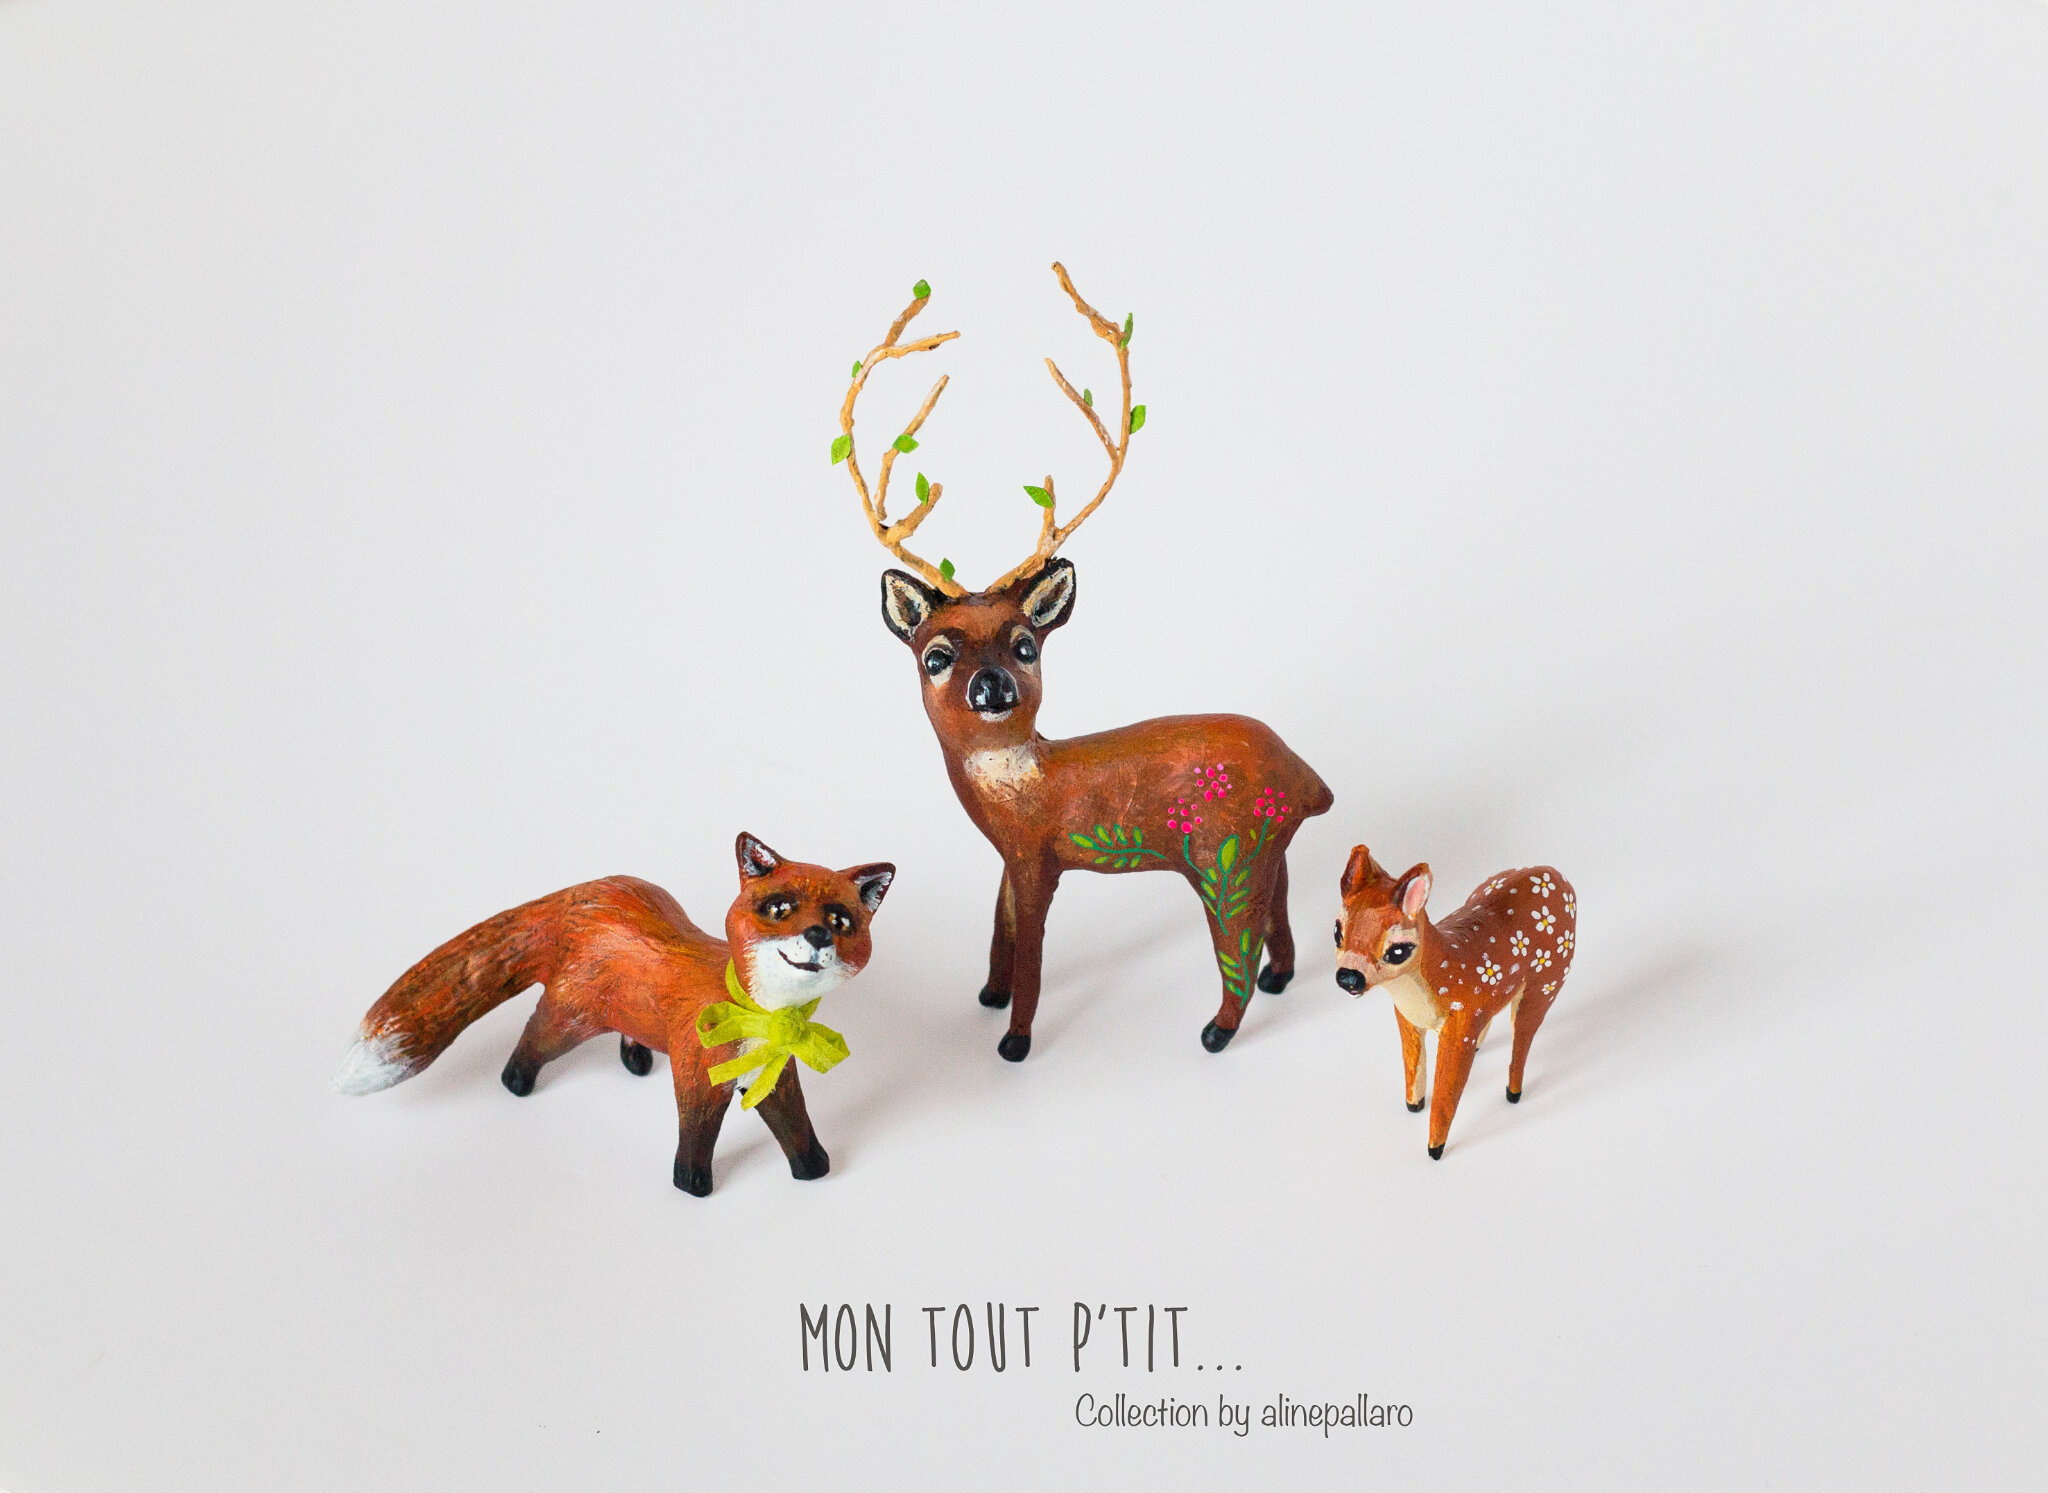 Montoutptit_papiermache_sculpture_alinepallaro_2018